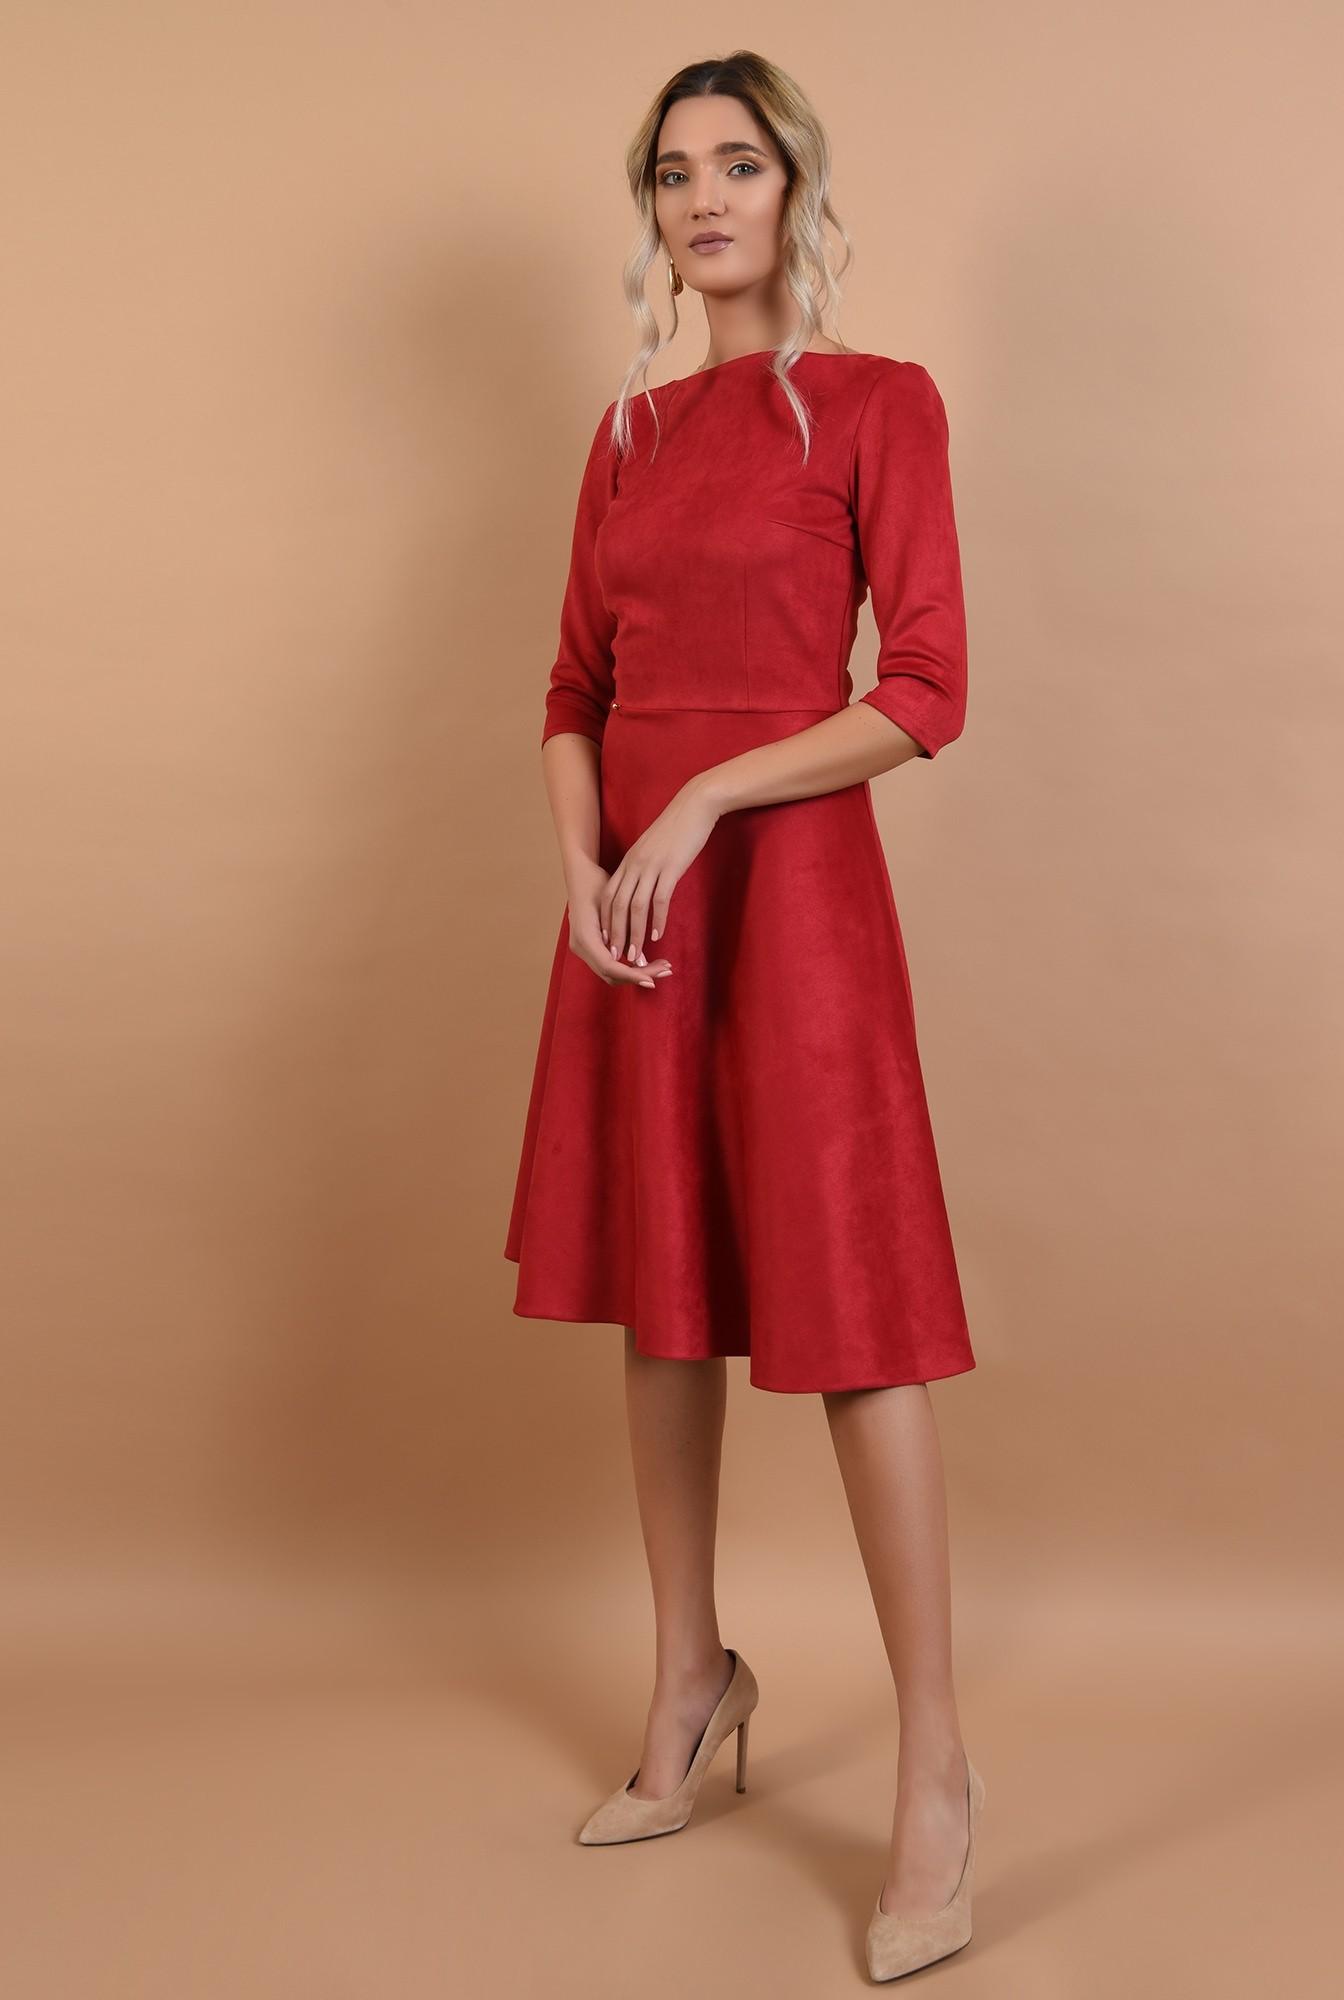 3 - rochie rosie, din piele intoarsa, maneci midi, nasturi aurii la spate, Poema